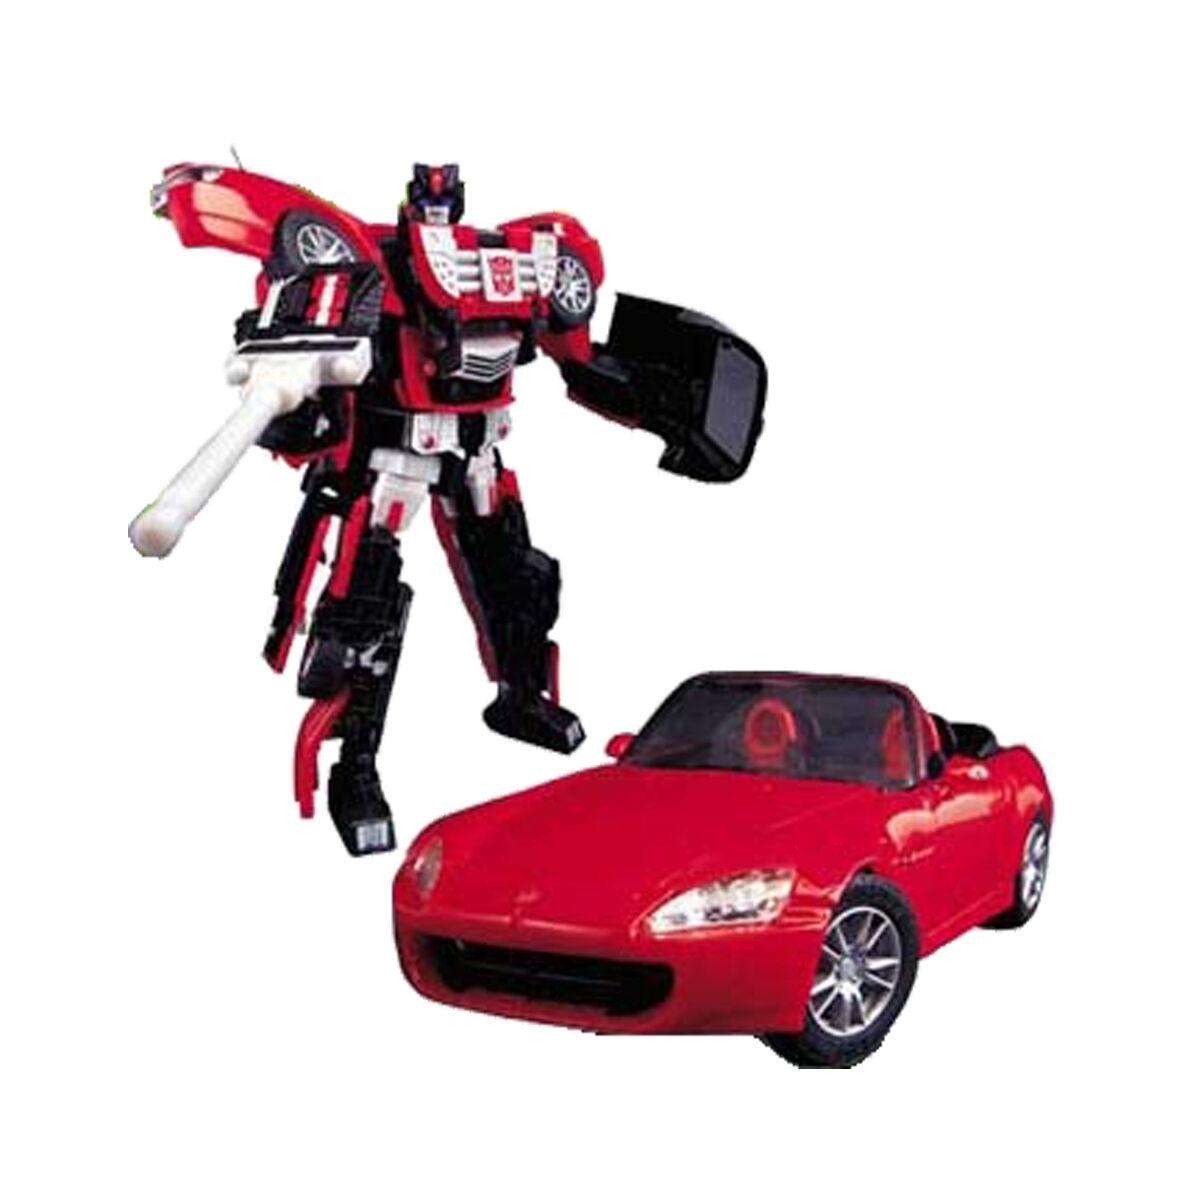 Binaltech BT-12 Overdrive Honda S2000 bodywork in metal - Transformers